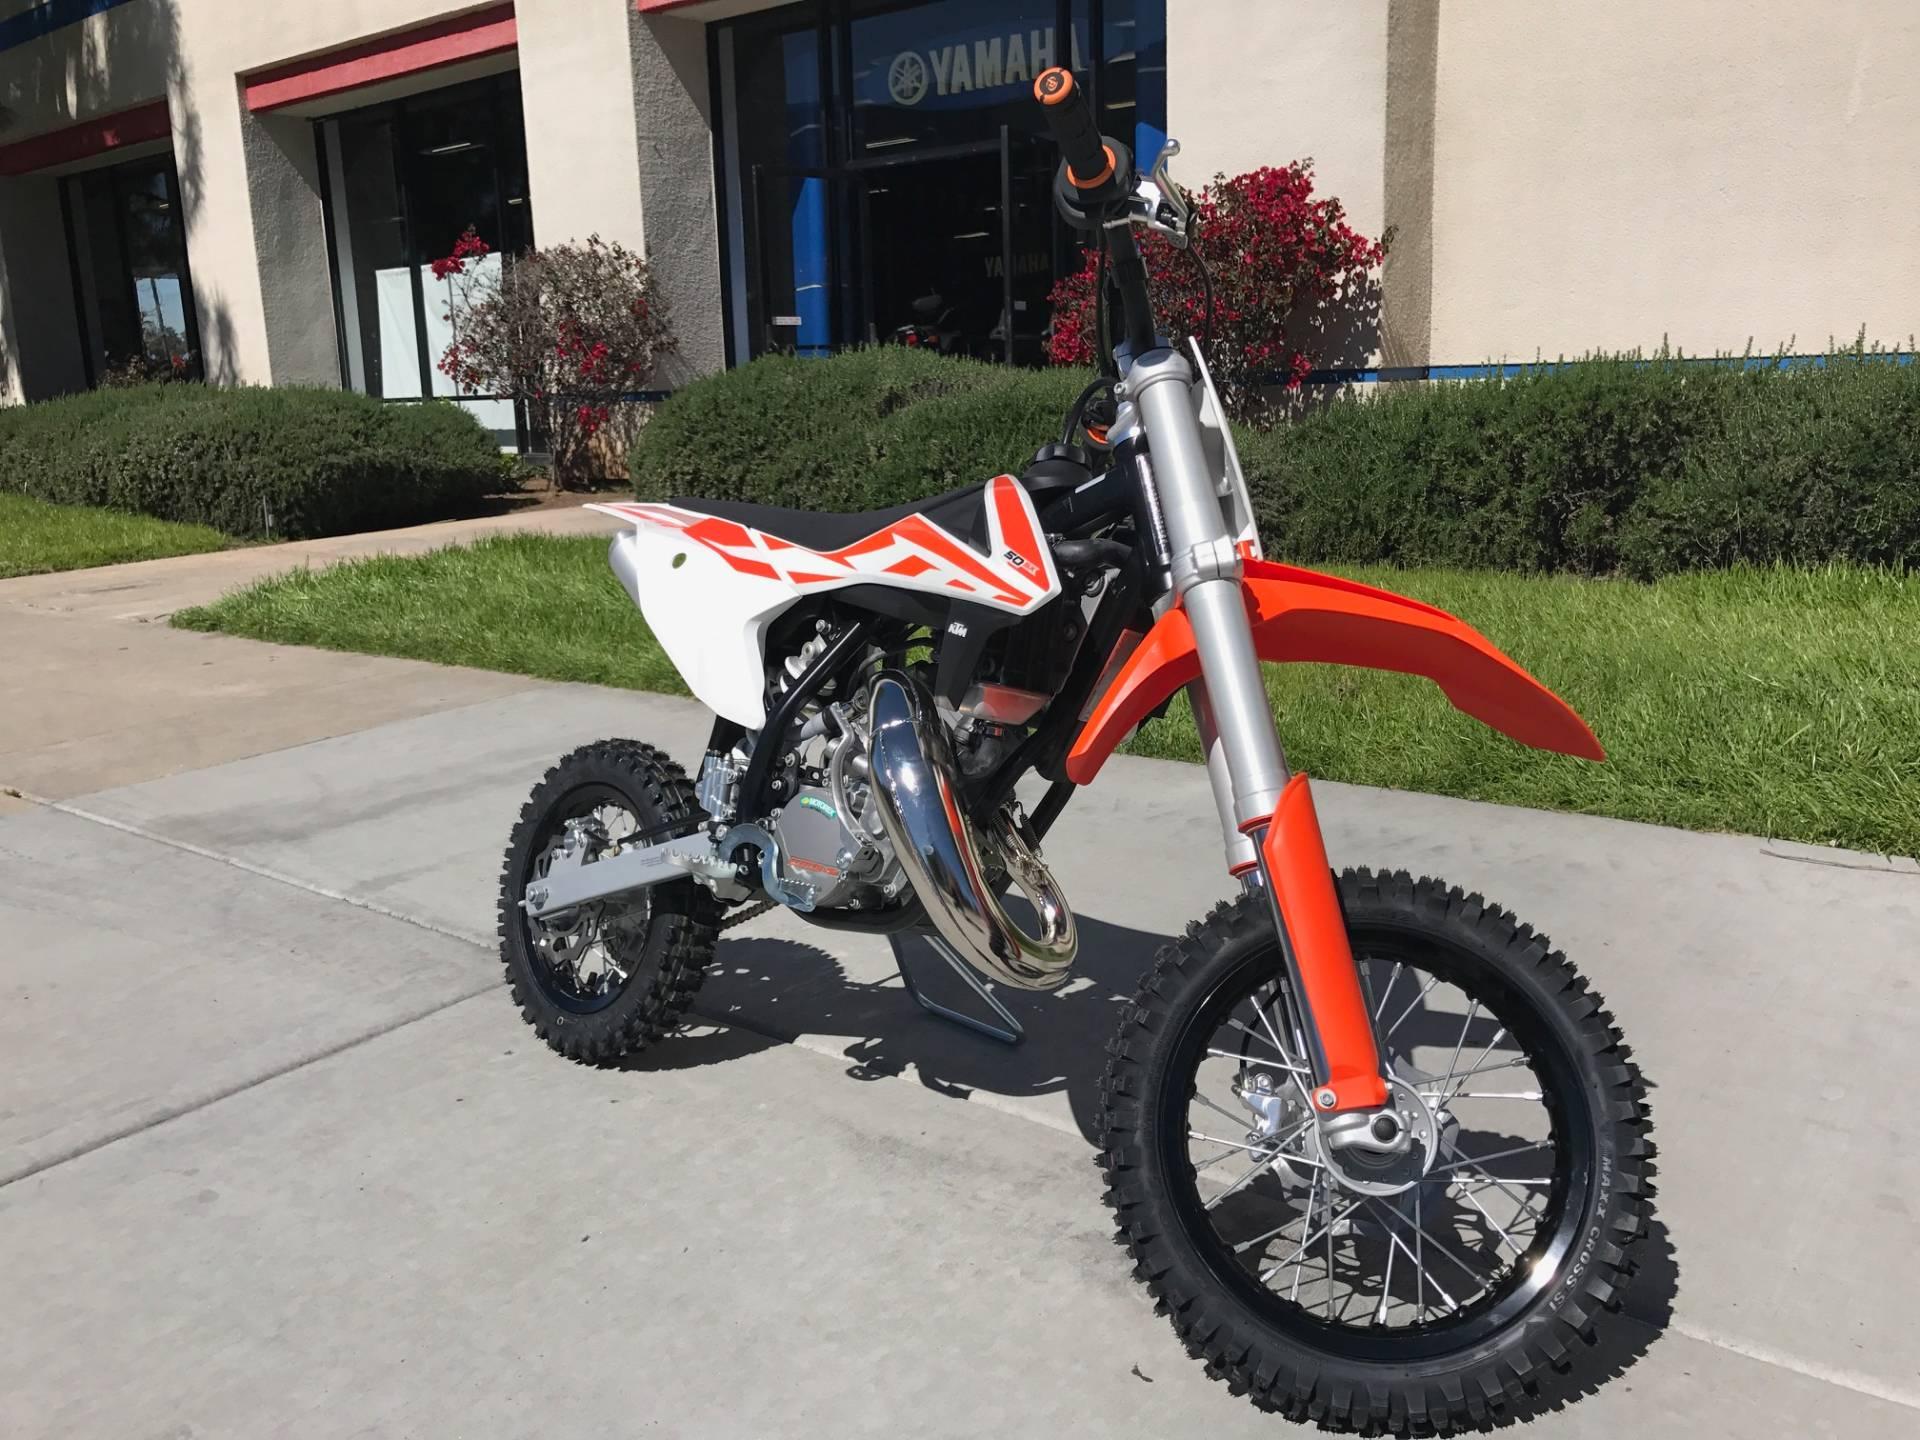 new 2017 ktm 50 sx motorcycles in el cajon, ca | stock number: n/a